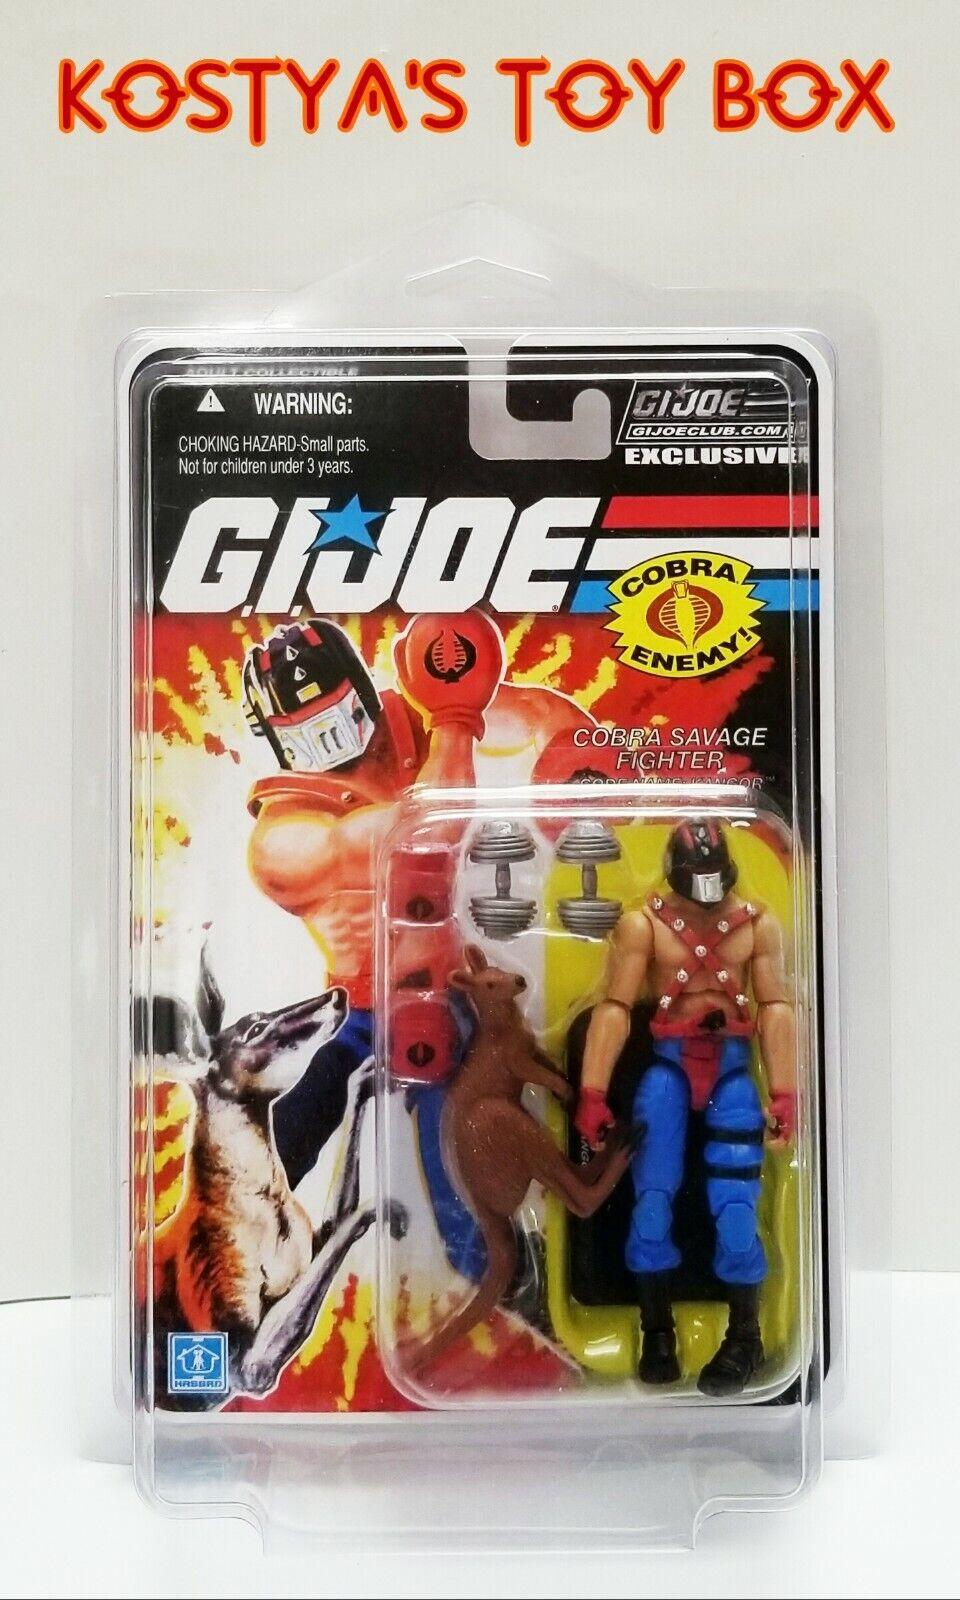 GI Joe KANGOR 2018 MOC MOC MOS Collectors Club 7.0 25 TH 30TH Action Figur